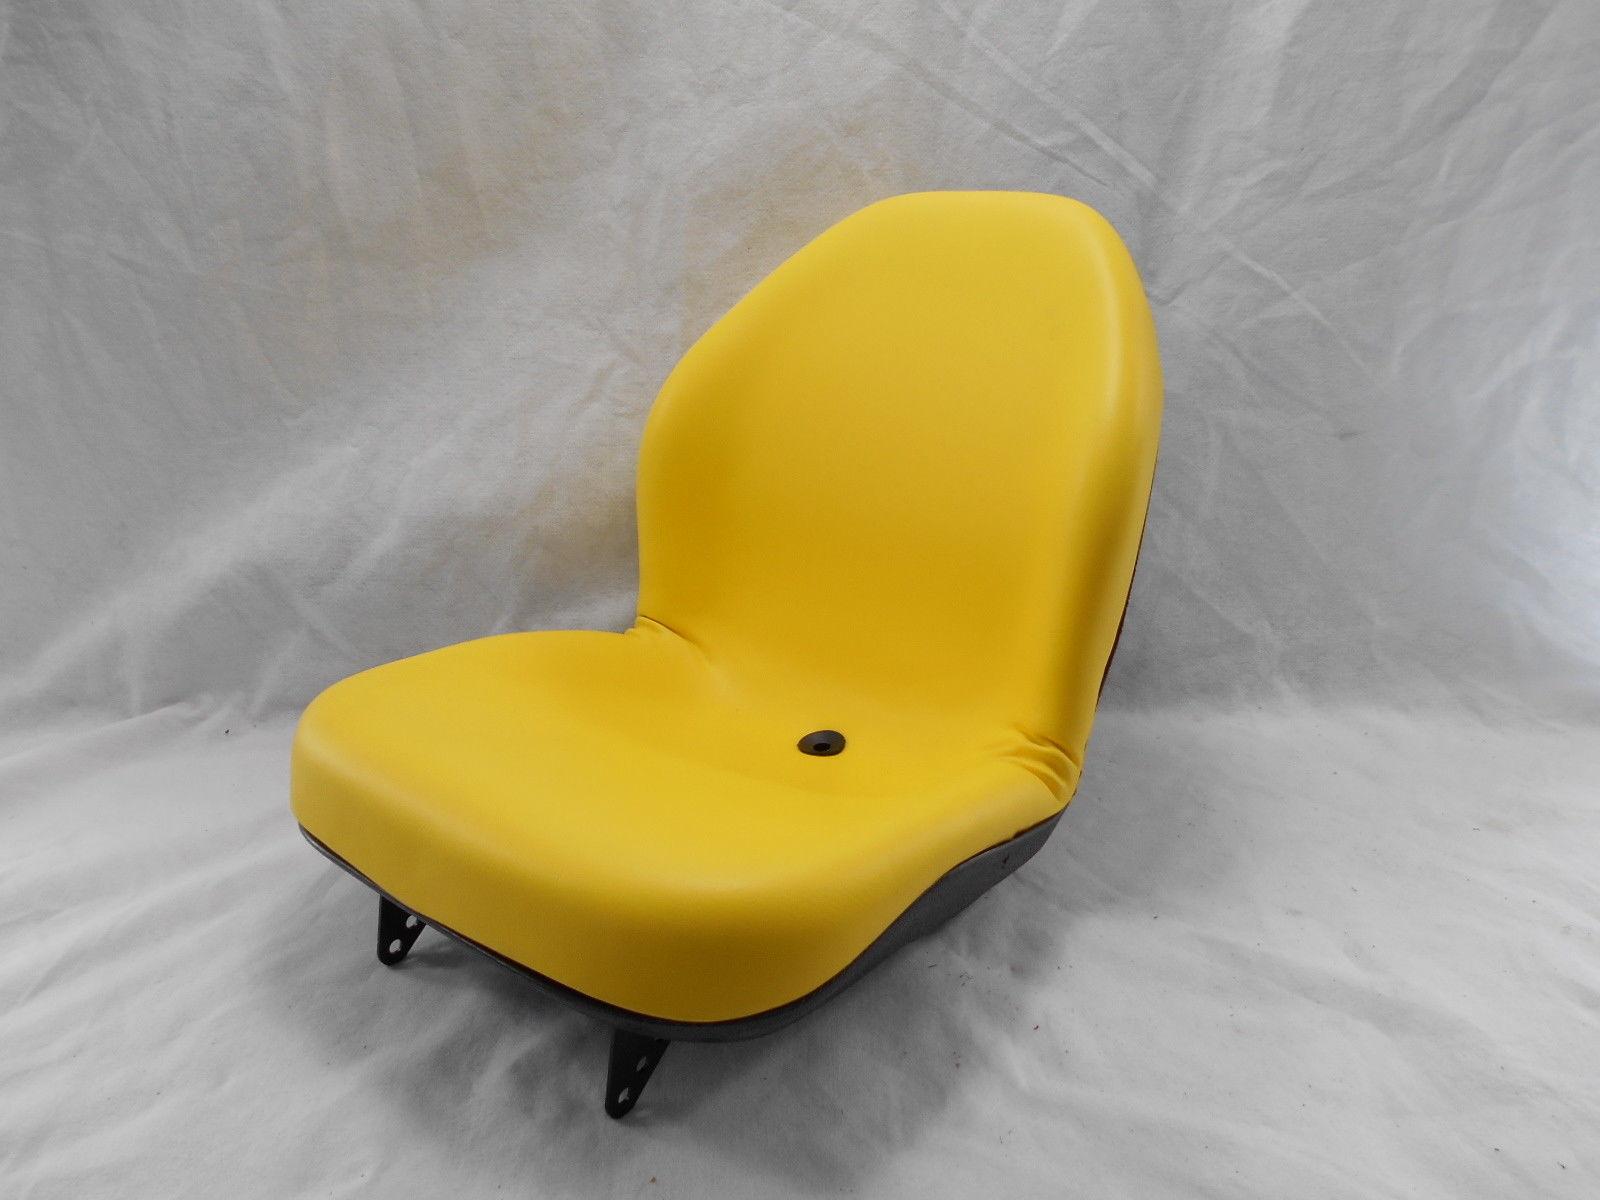 Wiring Diagram John Deere X465 Electrical Diagrams X475 Yellow Seat X465x475x485x495575585595x700 X595